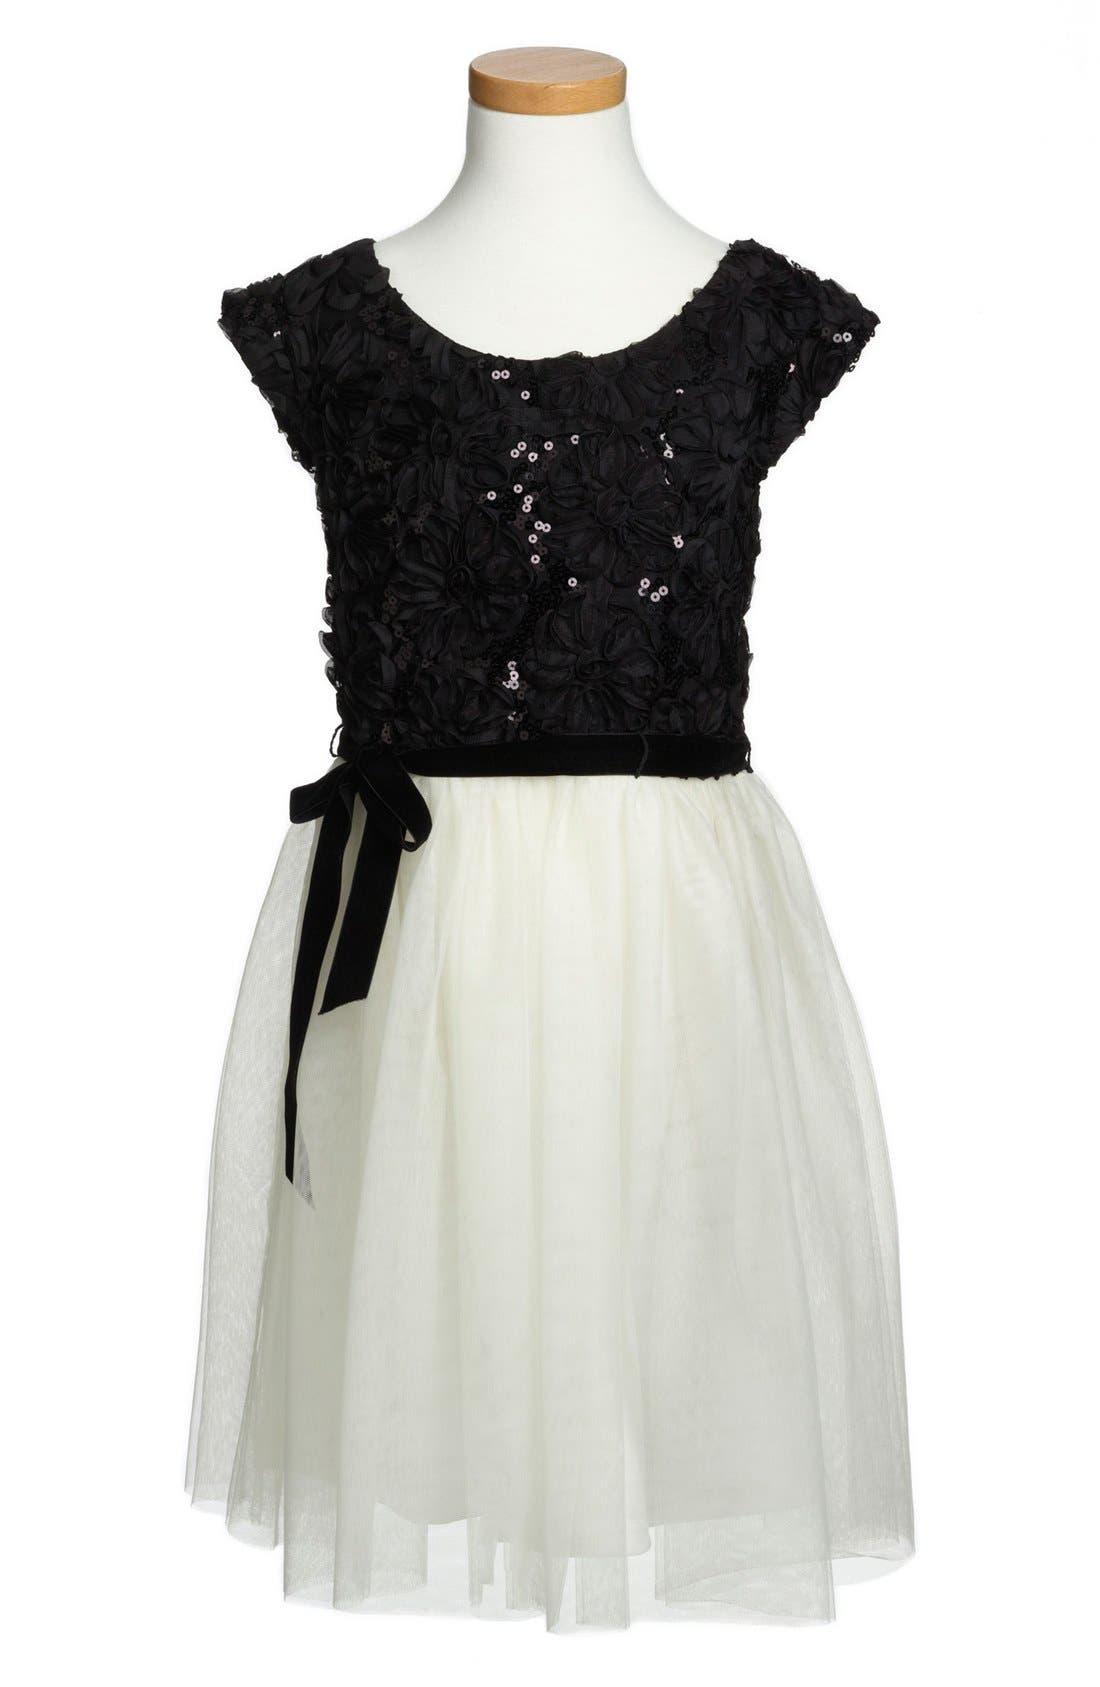 Main Image - Zunie Tulle Dress (Little Girls & Big Girls)